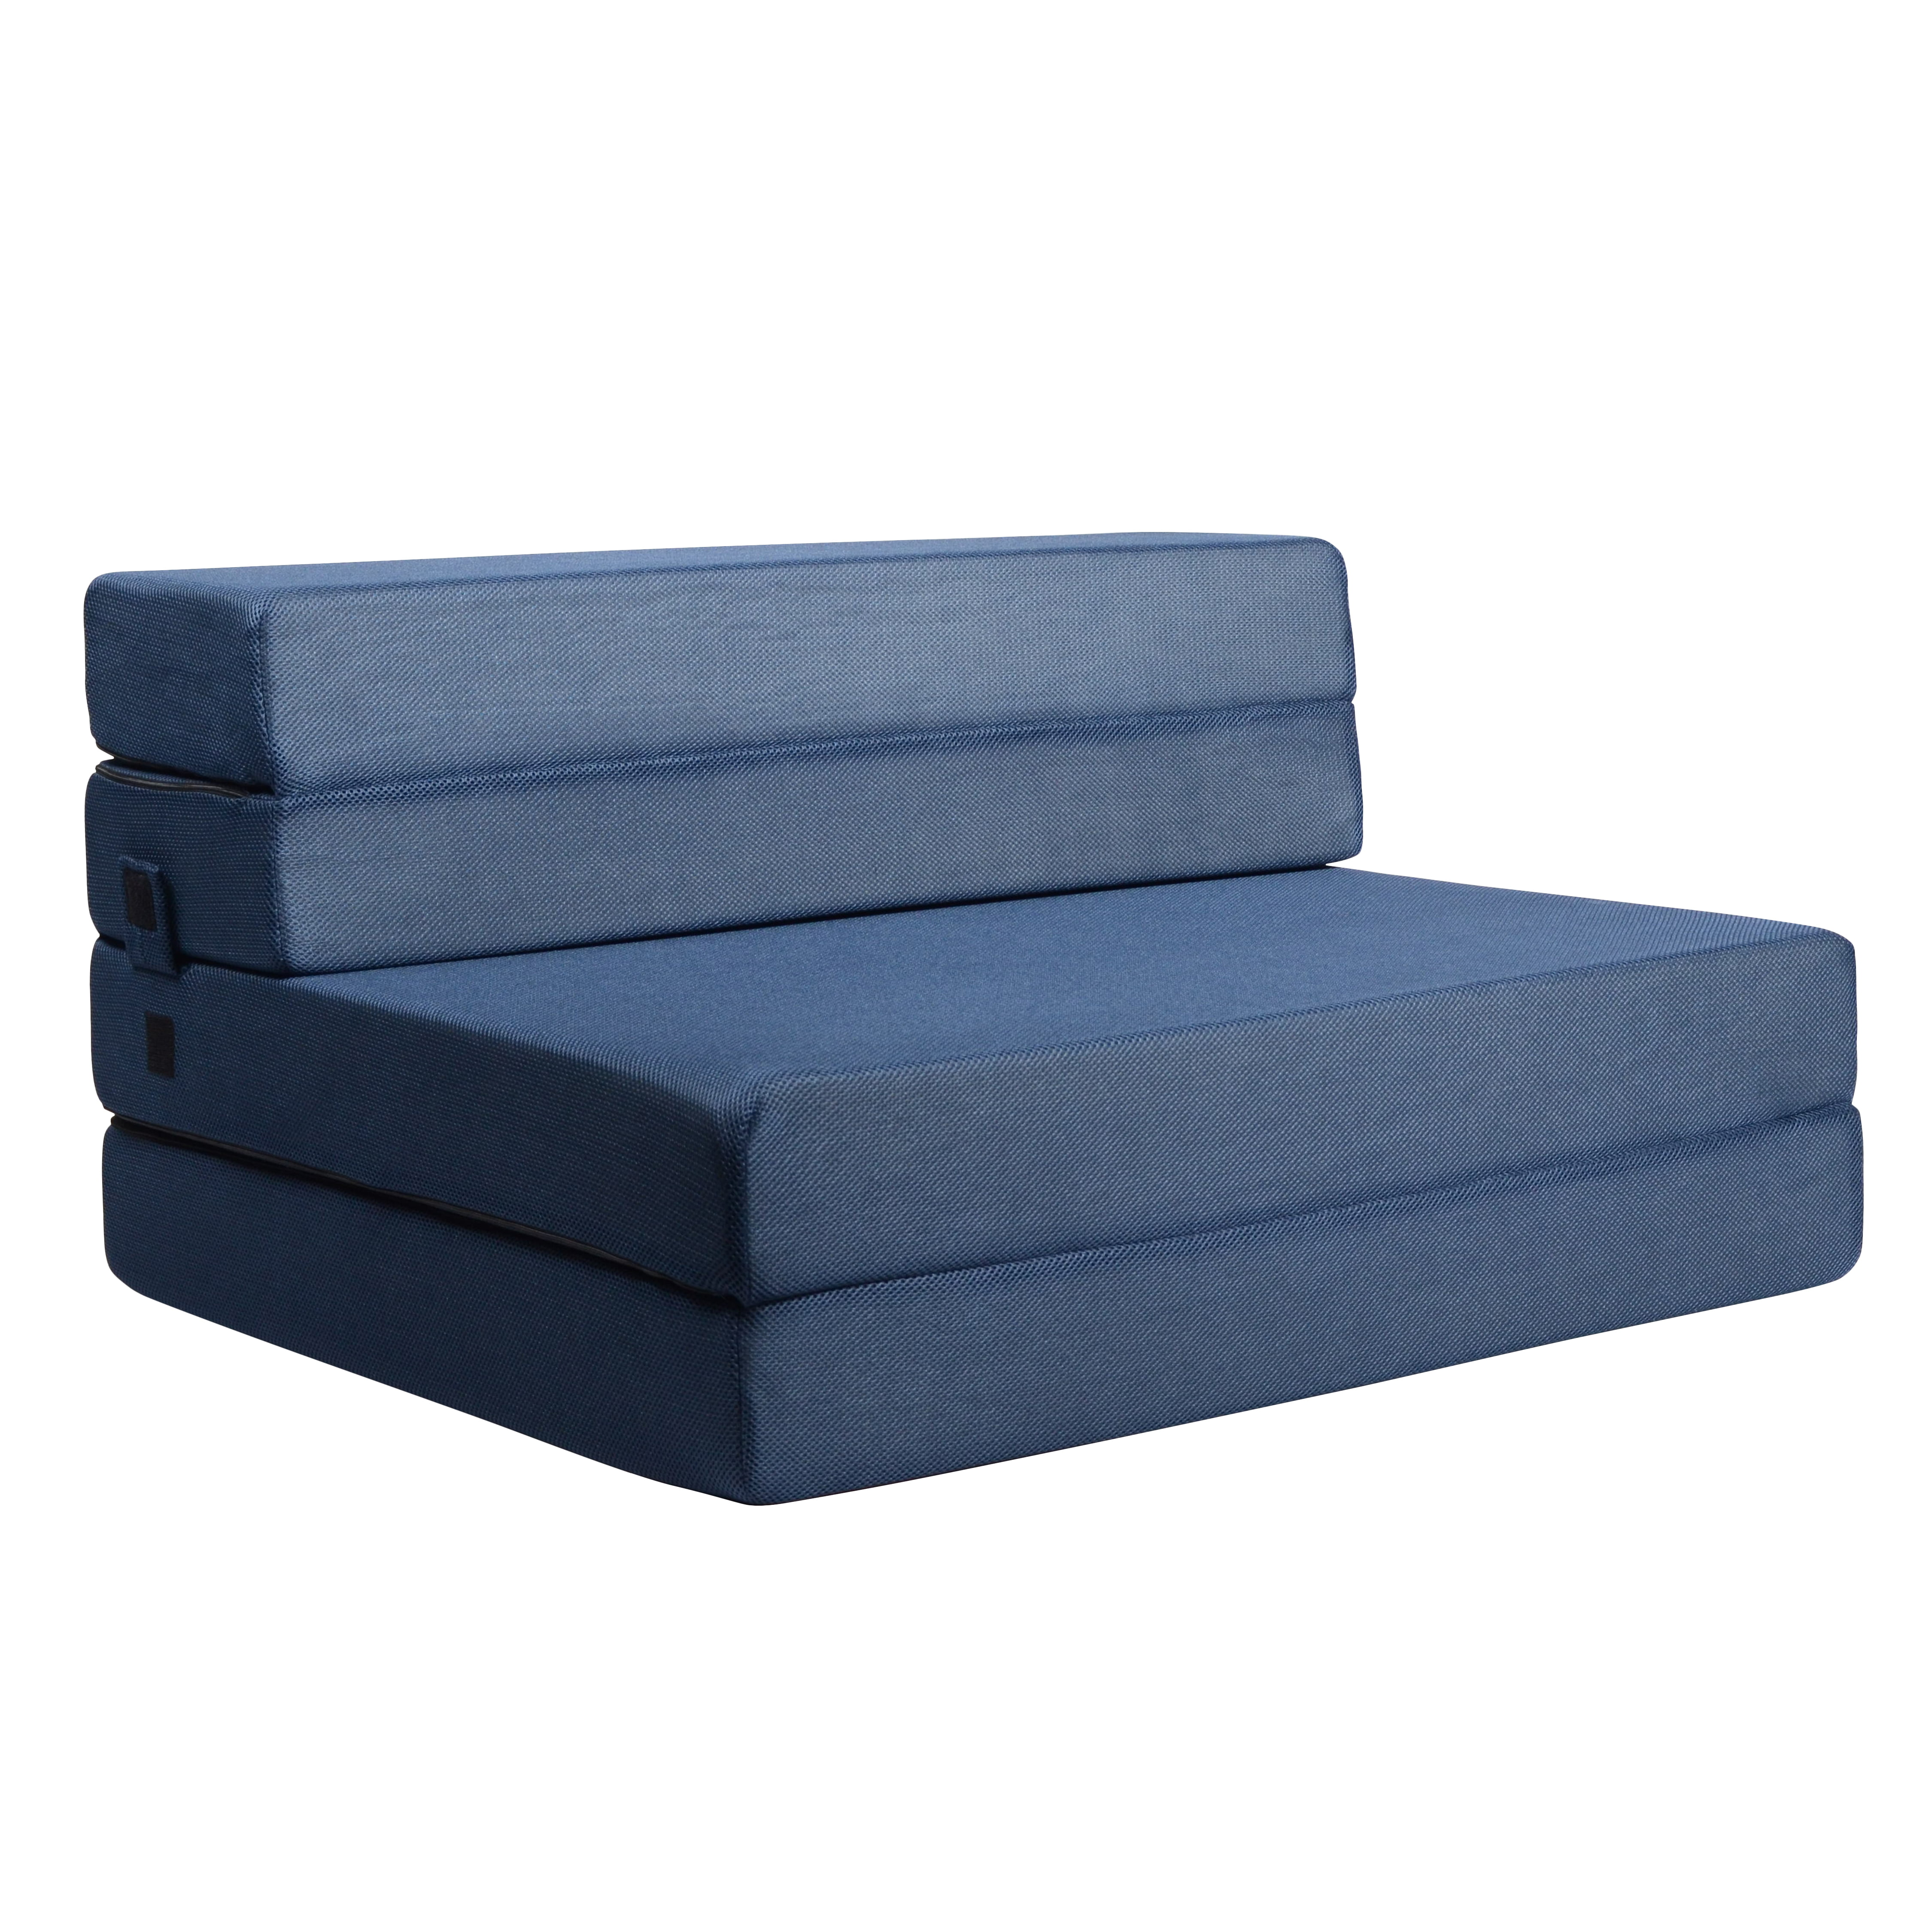 Picture of: Milliard Tri Fold Foam Folding Mattress And Sofa Bed For Guests Or Floor Mat Twin Xl 78x38x4 5 Inch Walmart Com Walmart Com